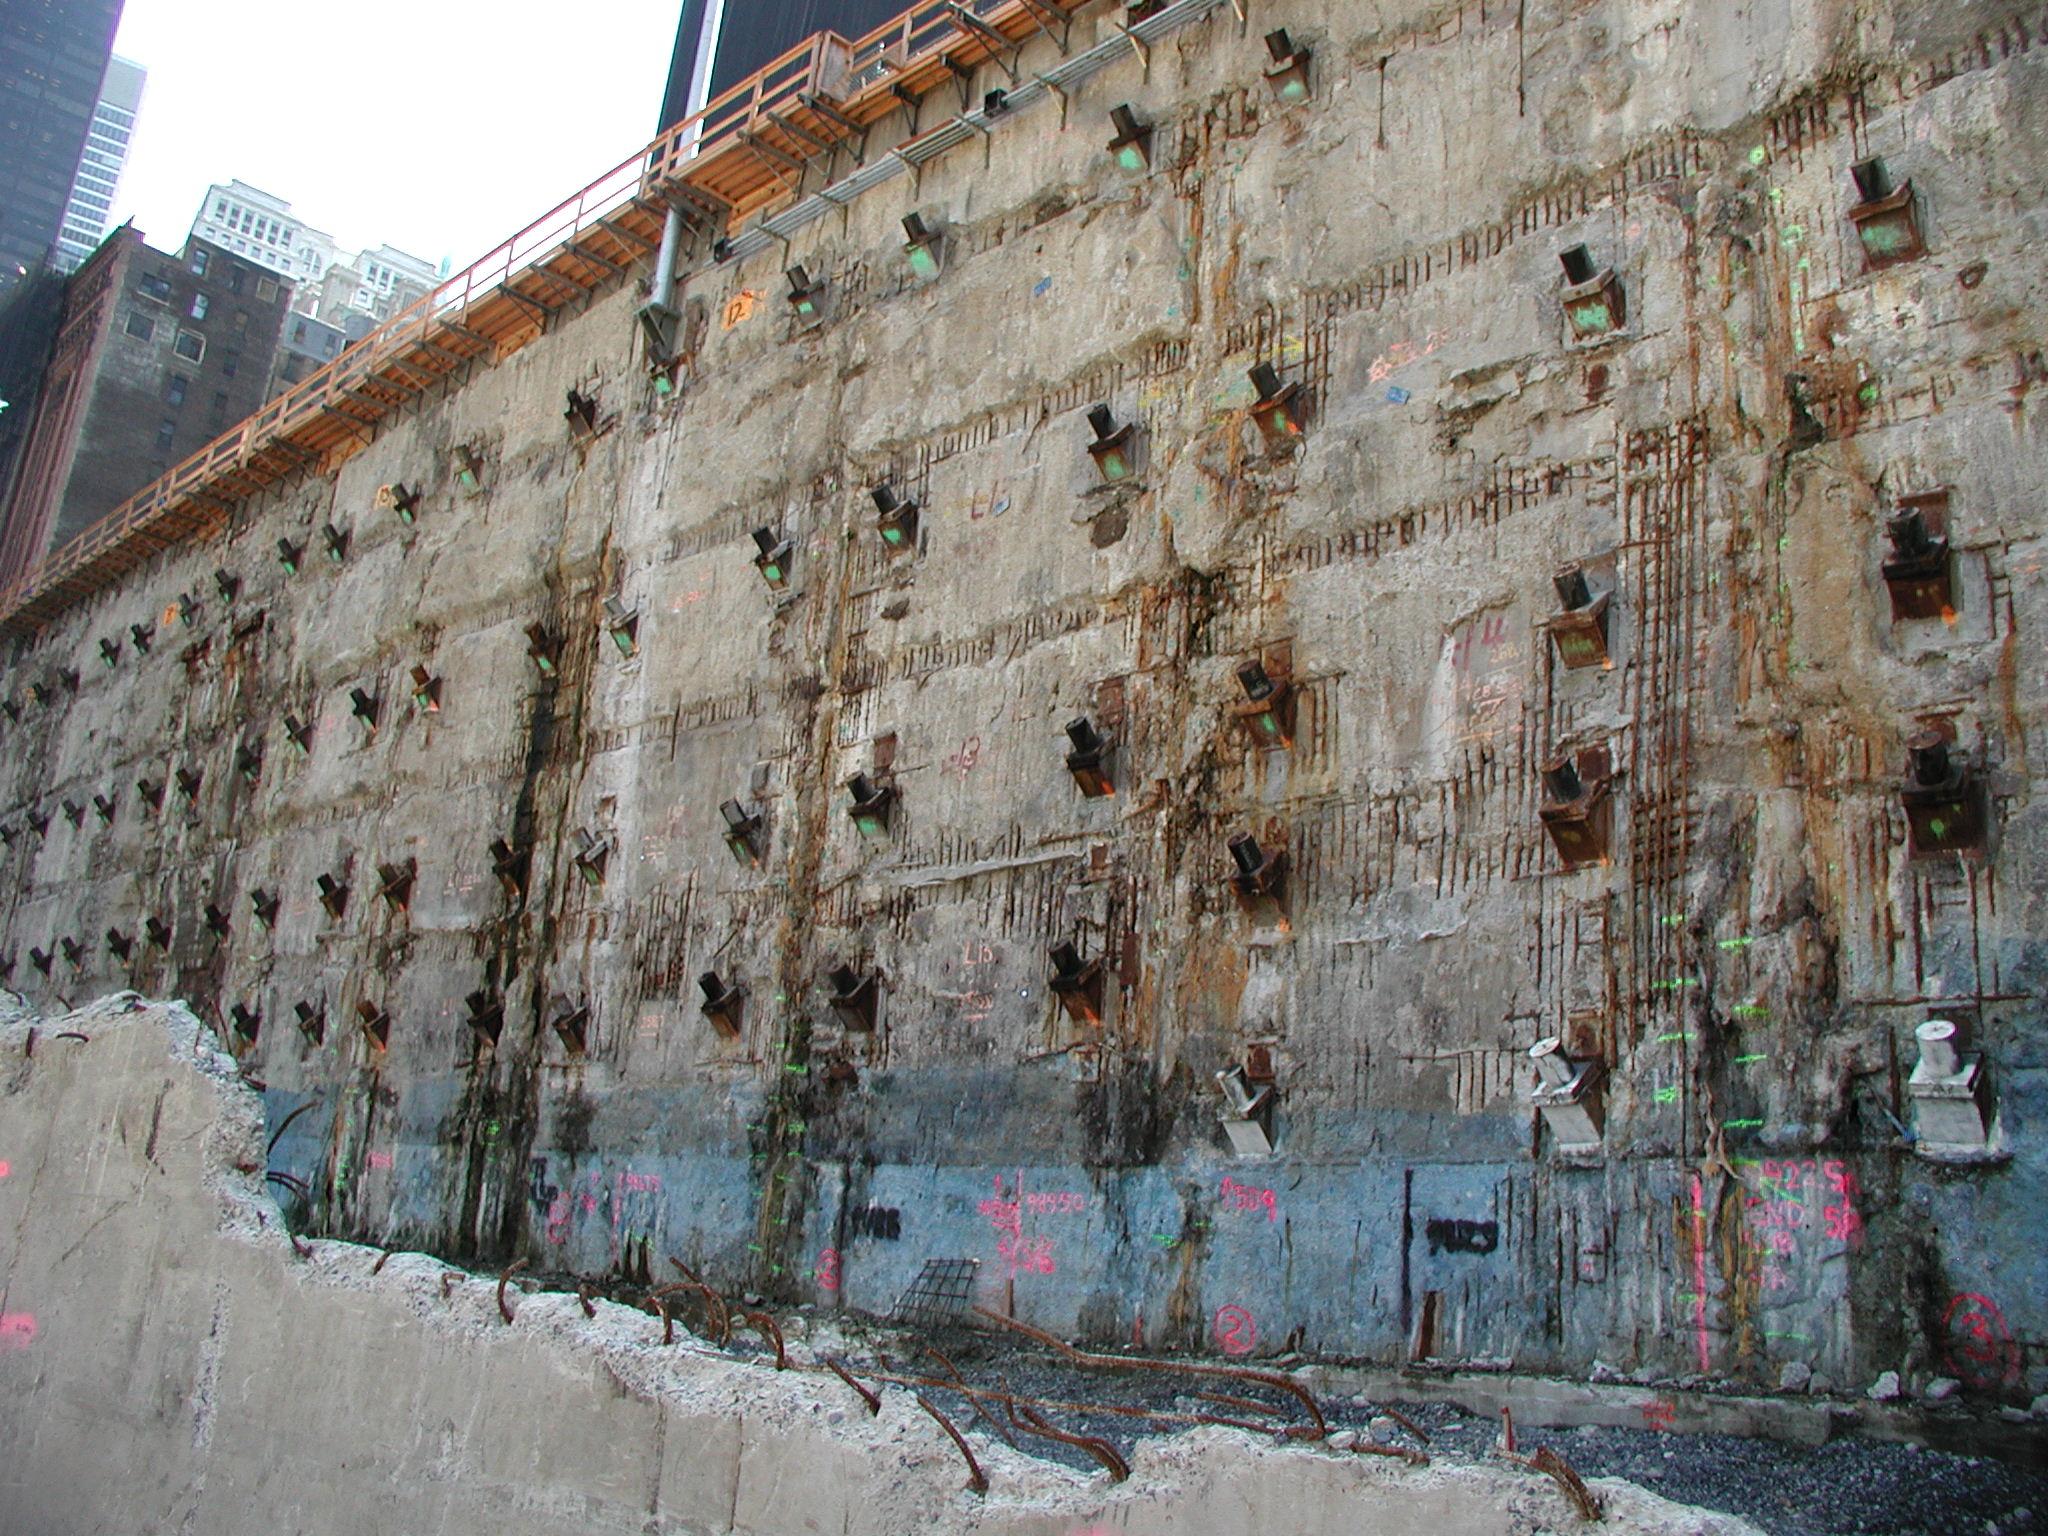 Slurry Wall Construction : File world trade center slurry wall eric ascalon